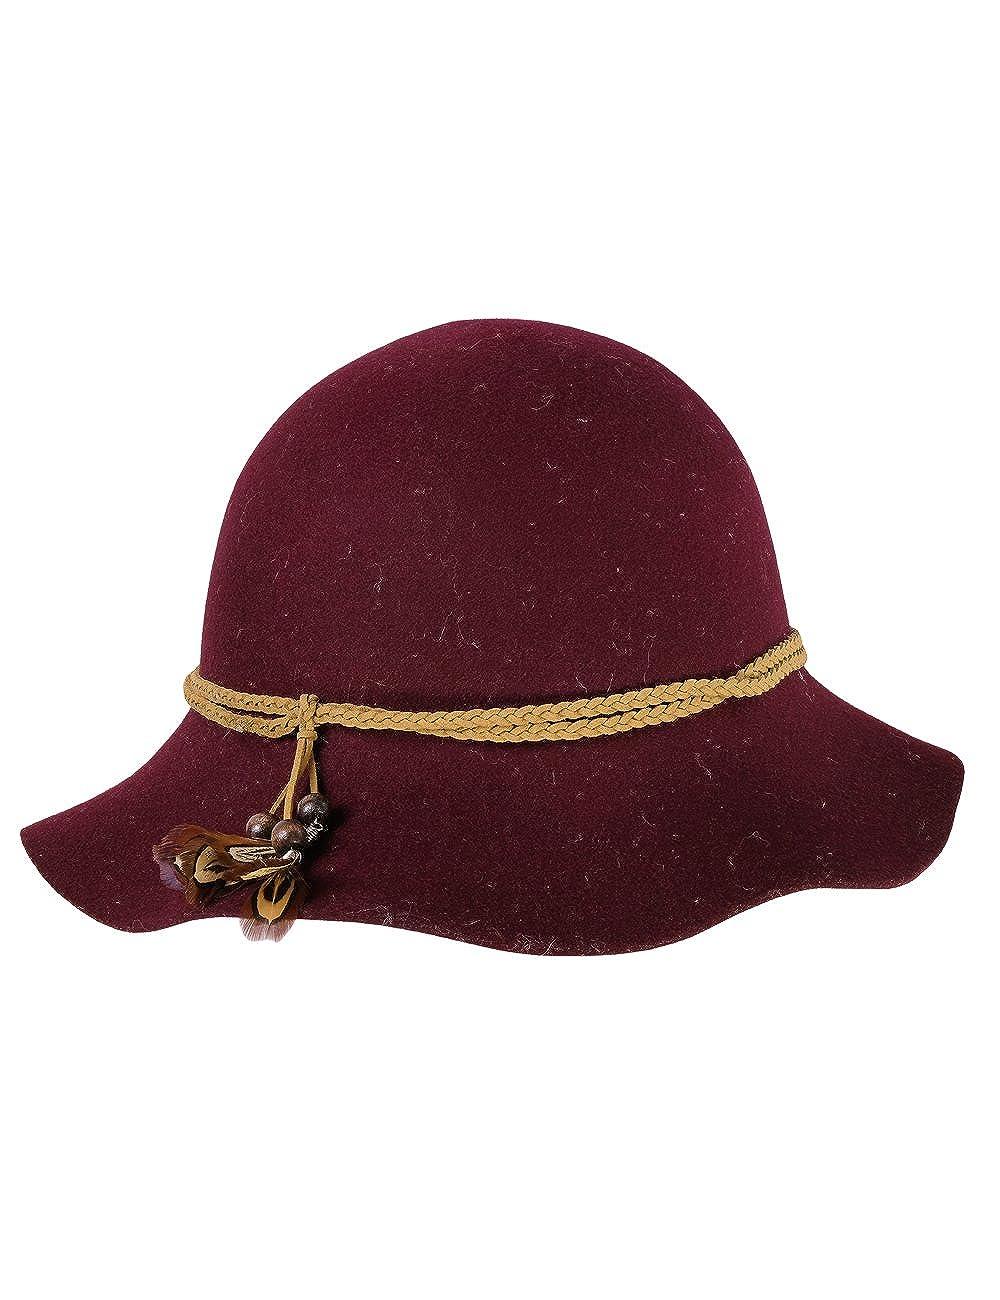 bff2986364dd9 CaPO SAN Marino Hat Fedora Noir (Black 20) Small Femme  Amazon.fr   Vêtements et accessoires